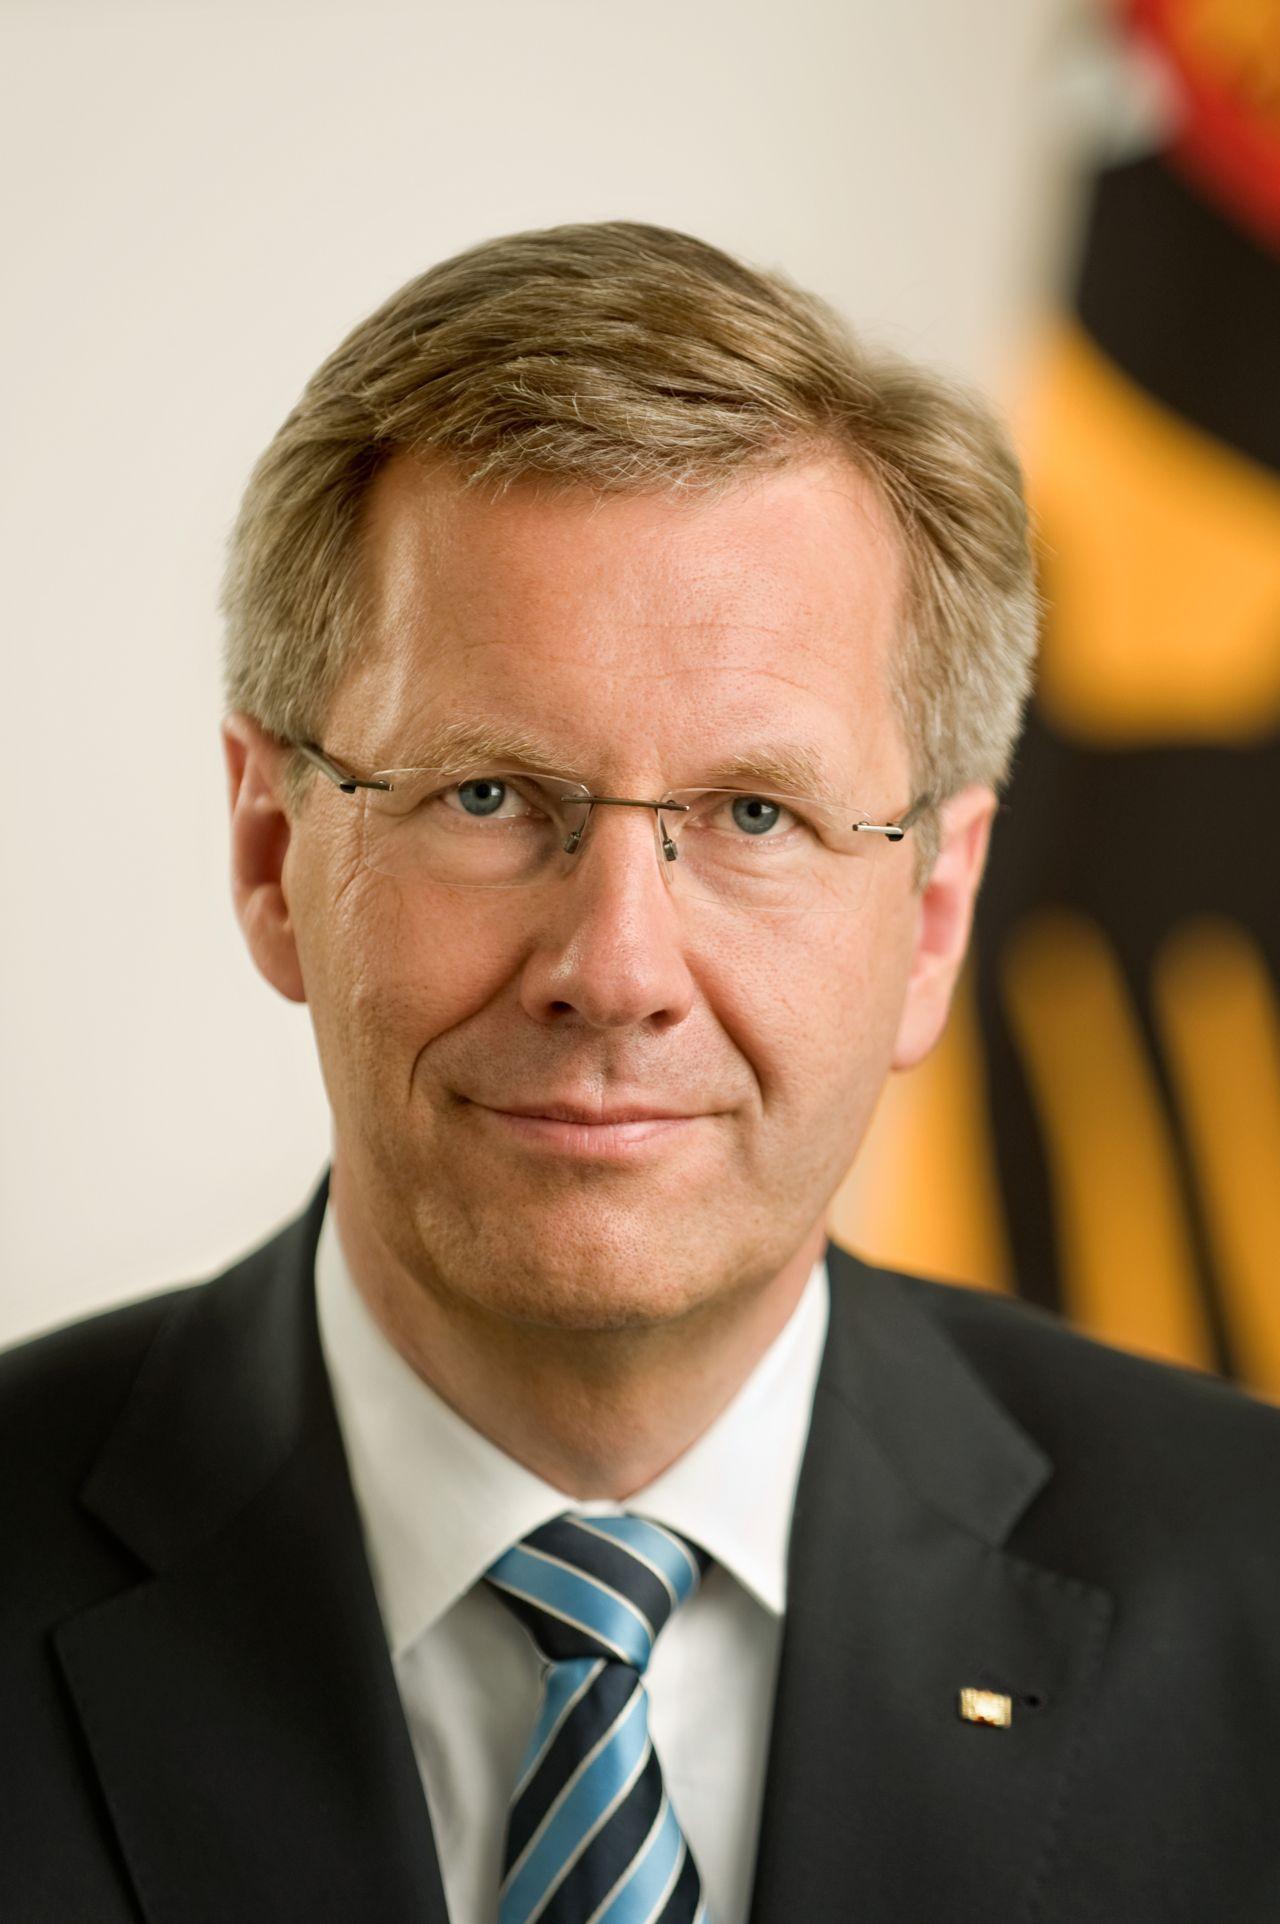 Christian Wulff Krebs